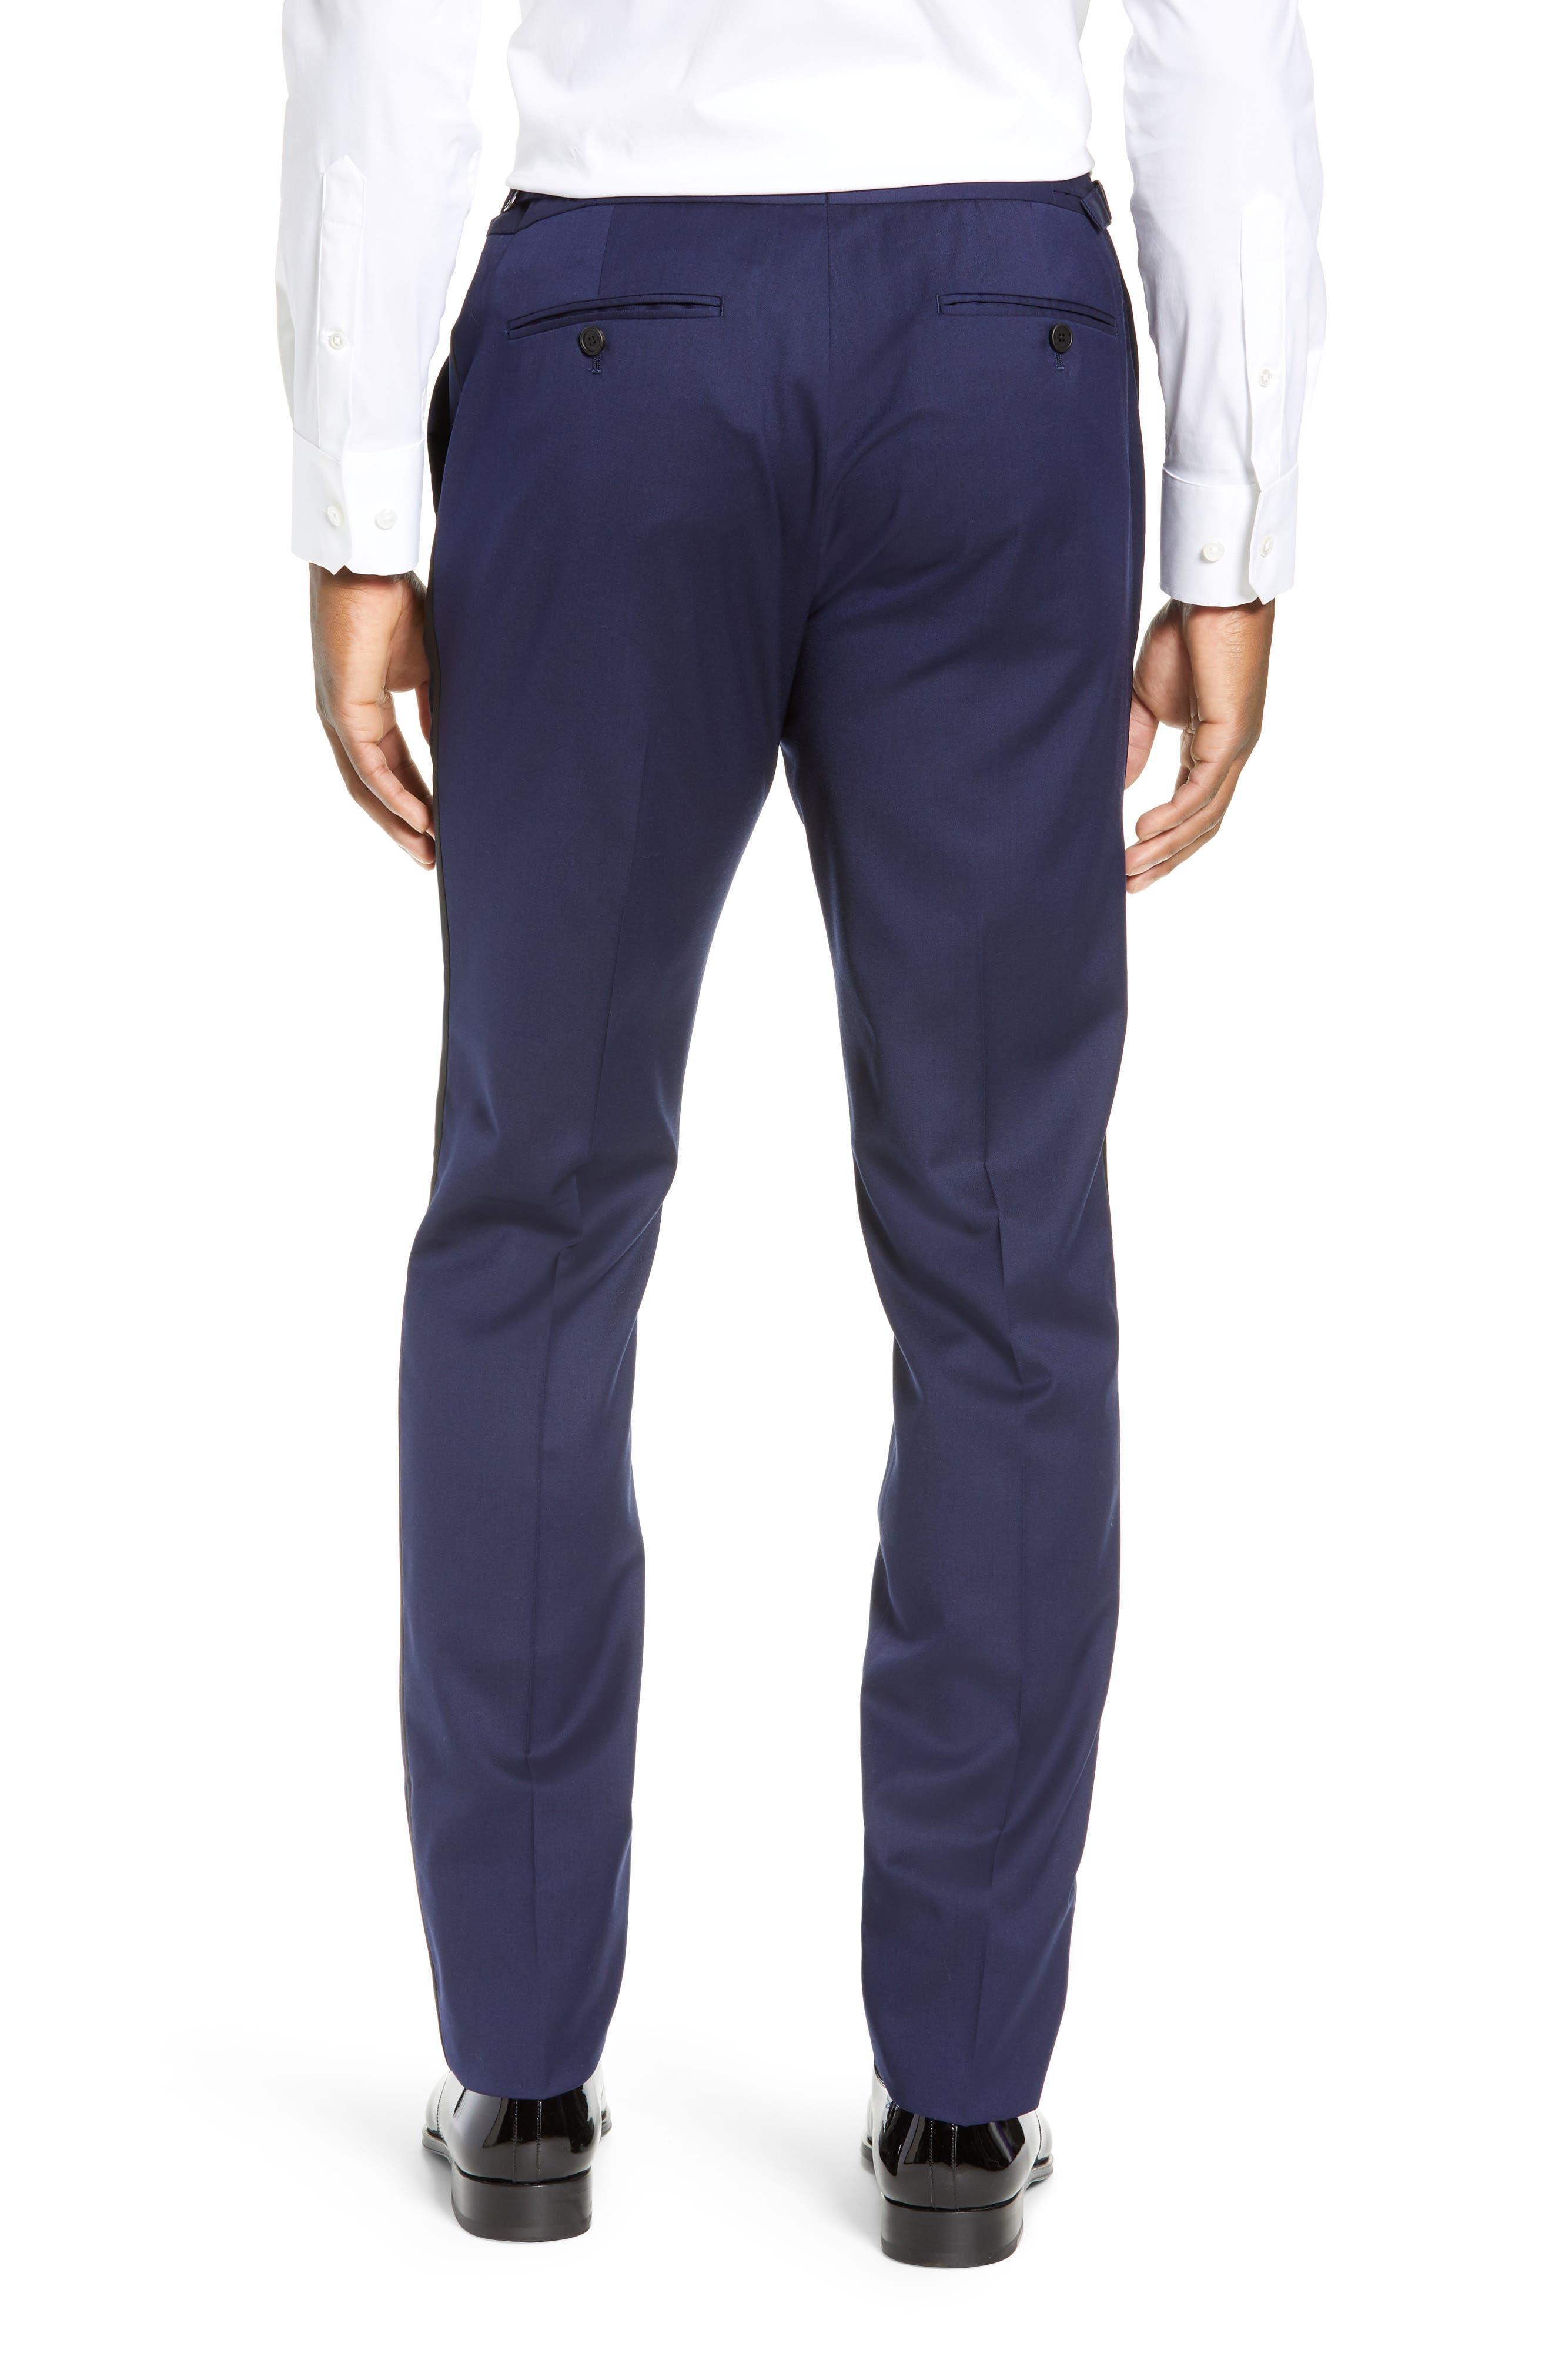 Capstone Slim Fit Tuxedo Trousers,                             Alternate thumbnail 2, color,                             NAVY